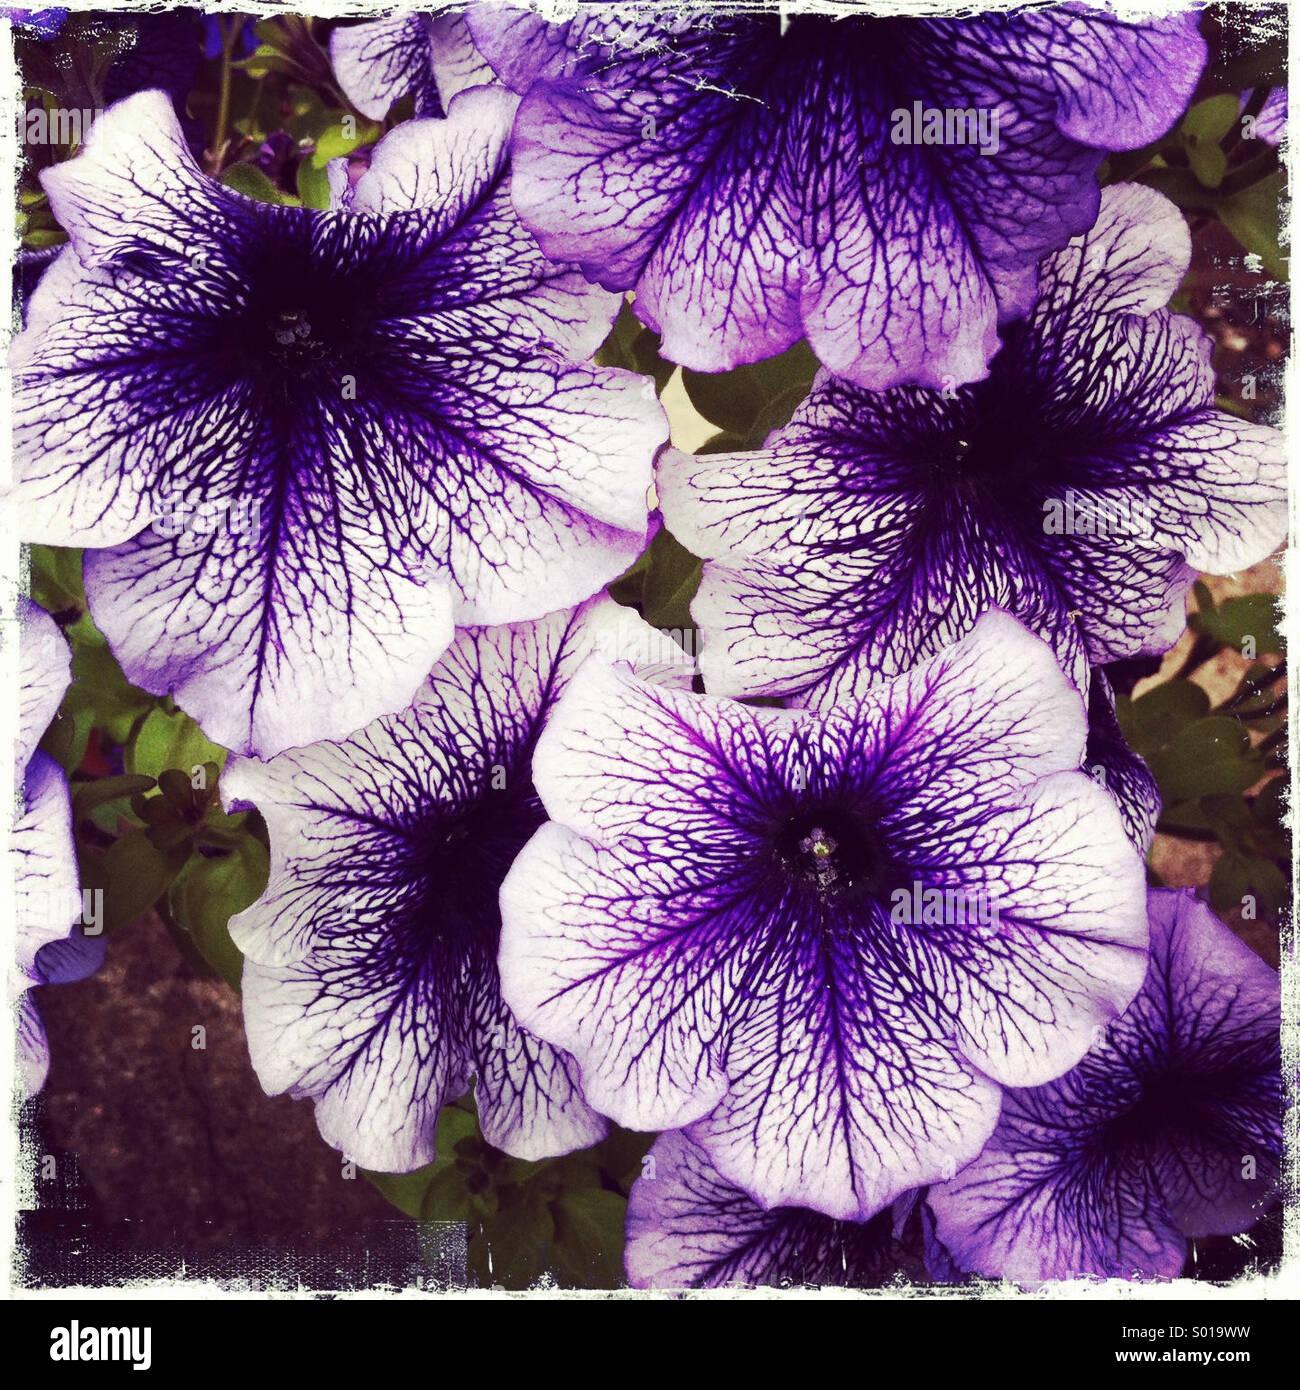 Purple flowers - Stock Image